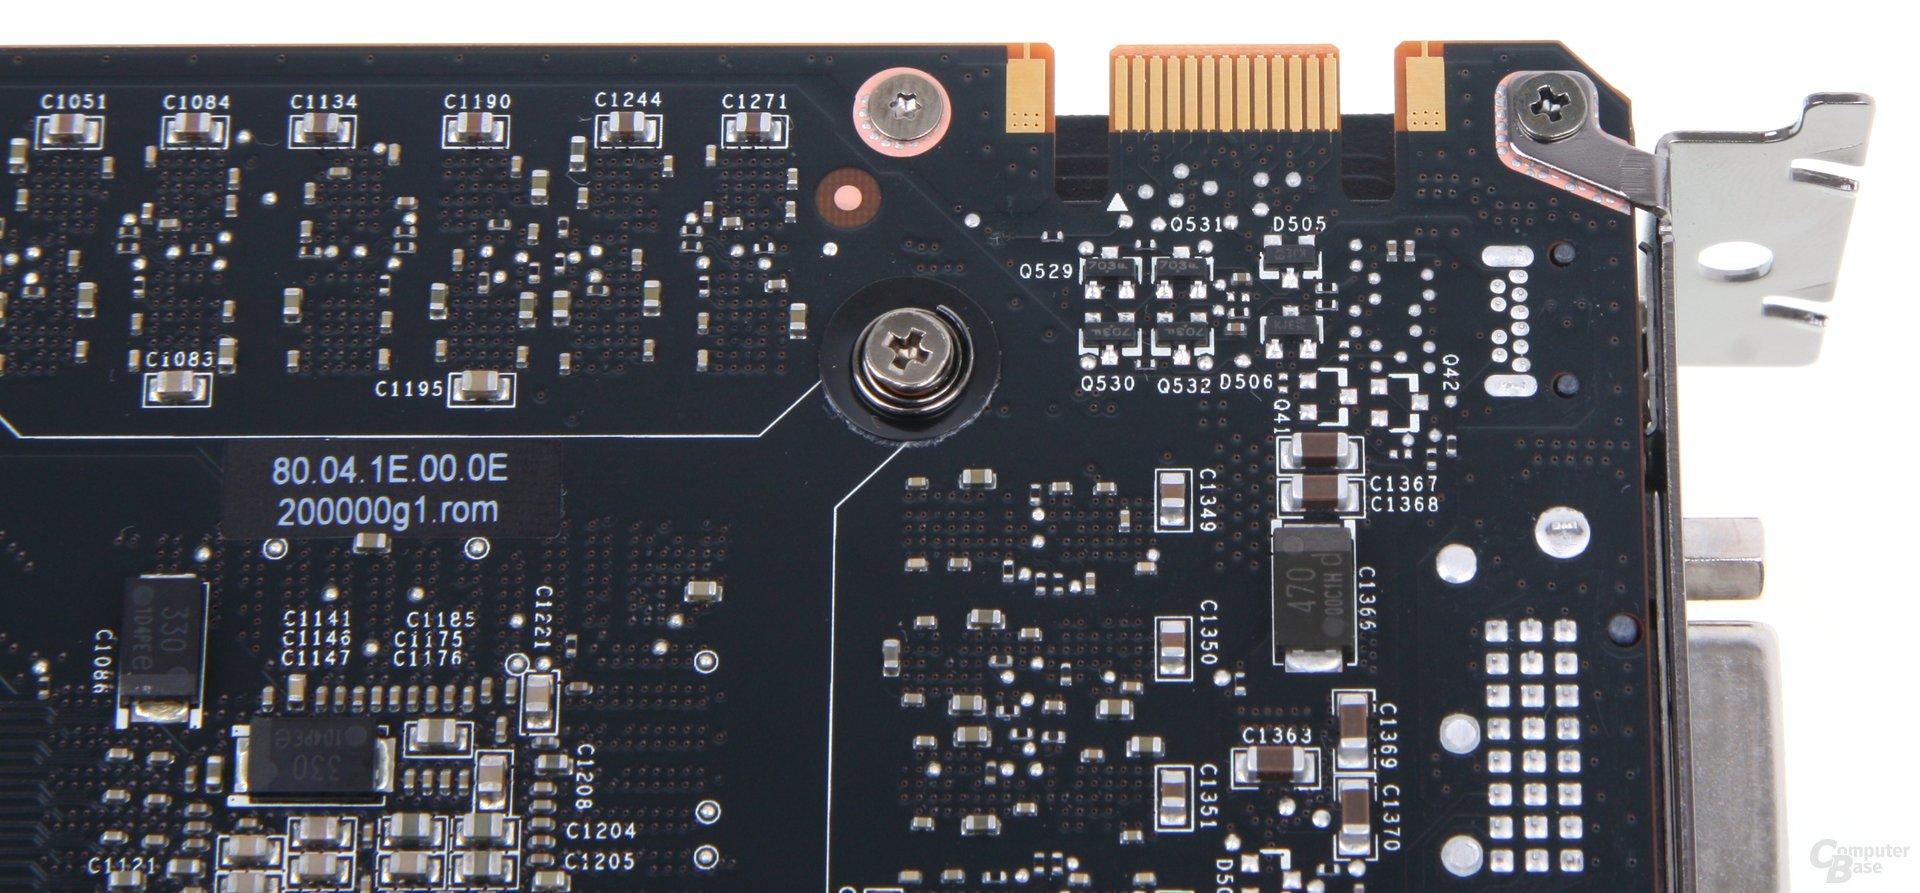 GeForce GTX 690 SLI-Anschlüss